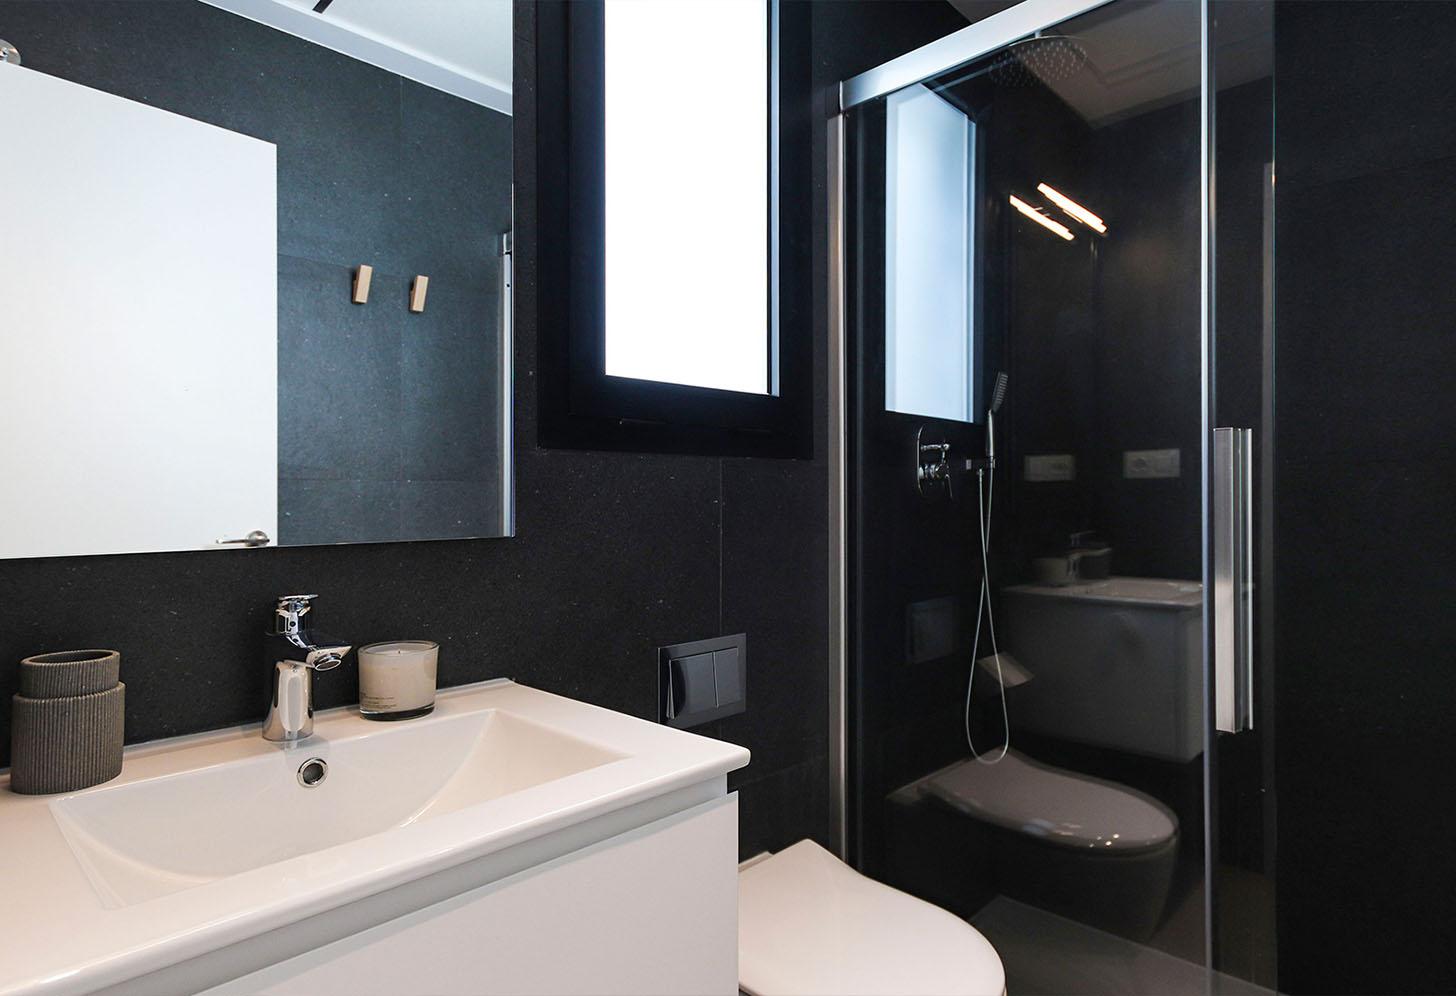 immobilier neuf espagne costa blanca on-3b essence duplex sdb 1